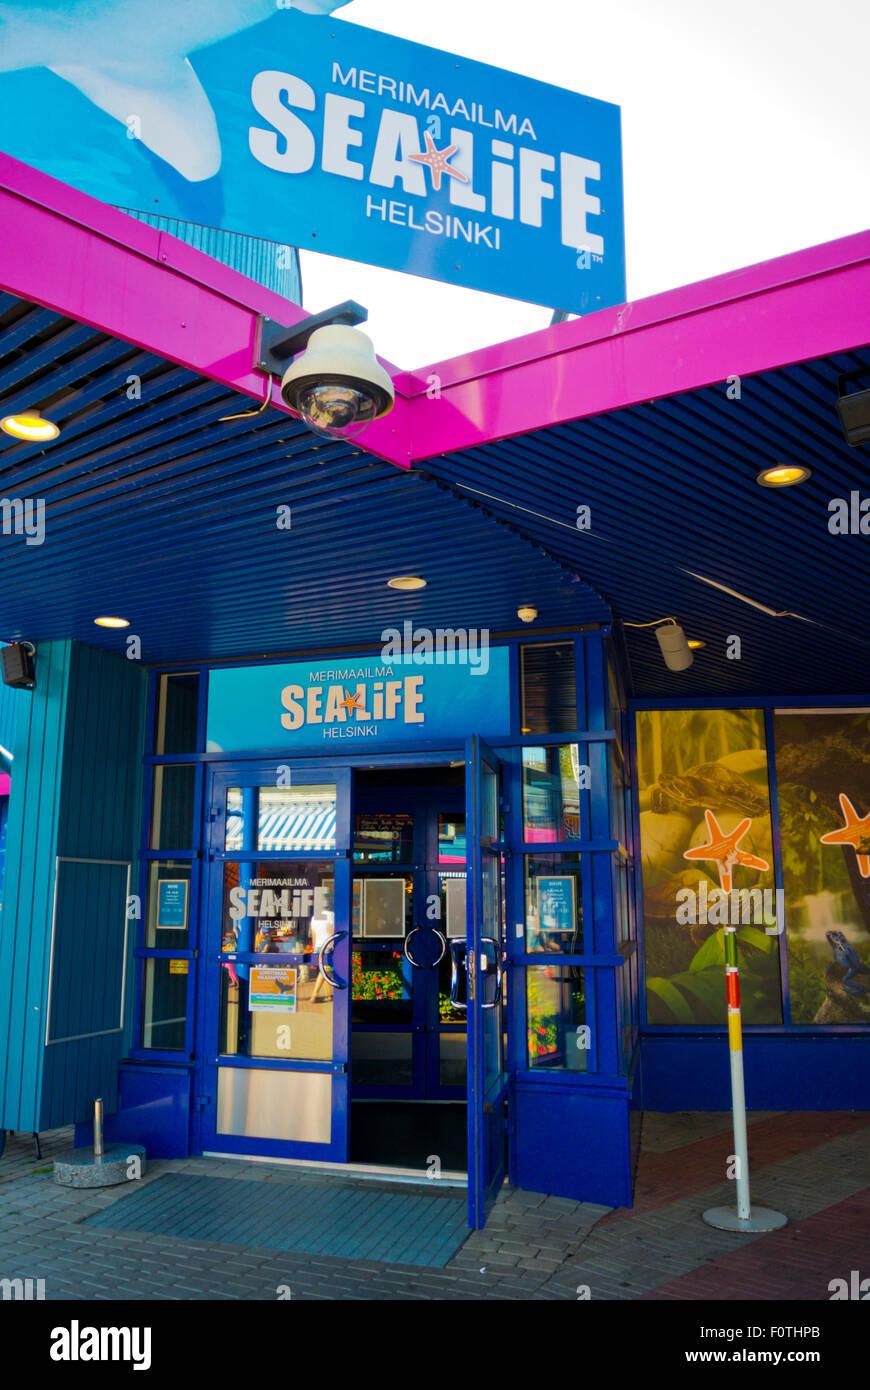 Entrance to Sealife merimaailma maritime exhibition, Linnanmäki, amusement park, Alppila, Helsinki, Finland, - Stock Image